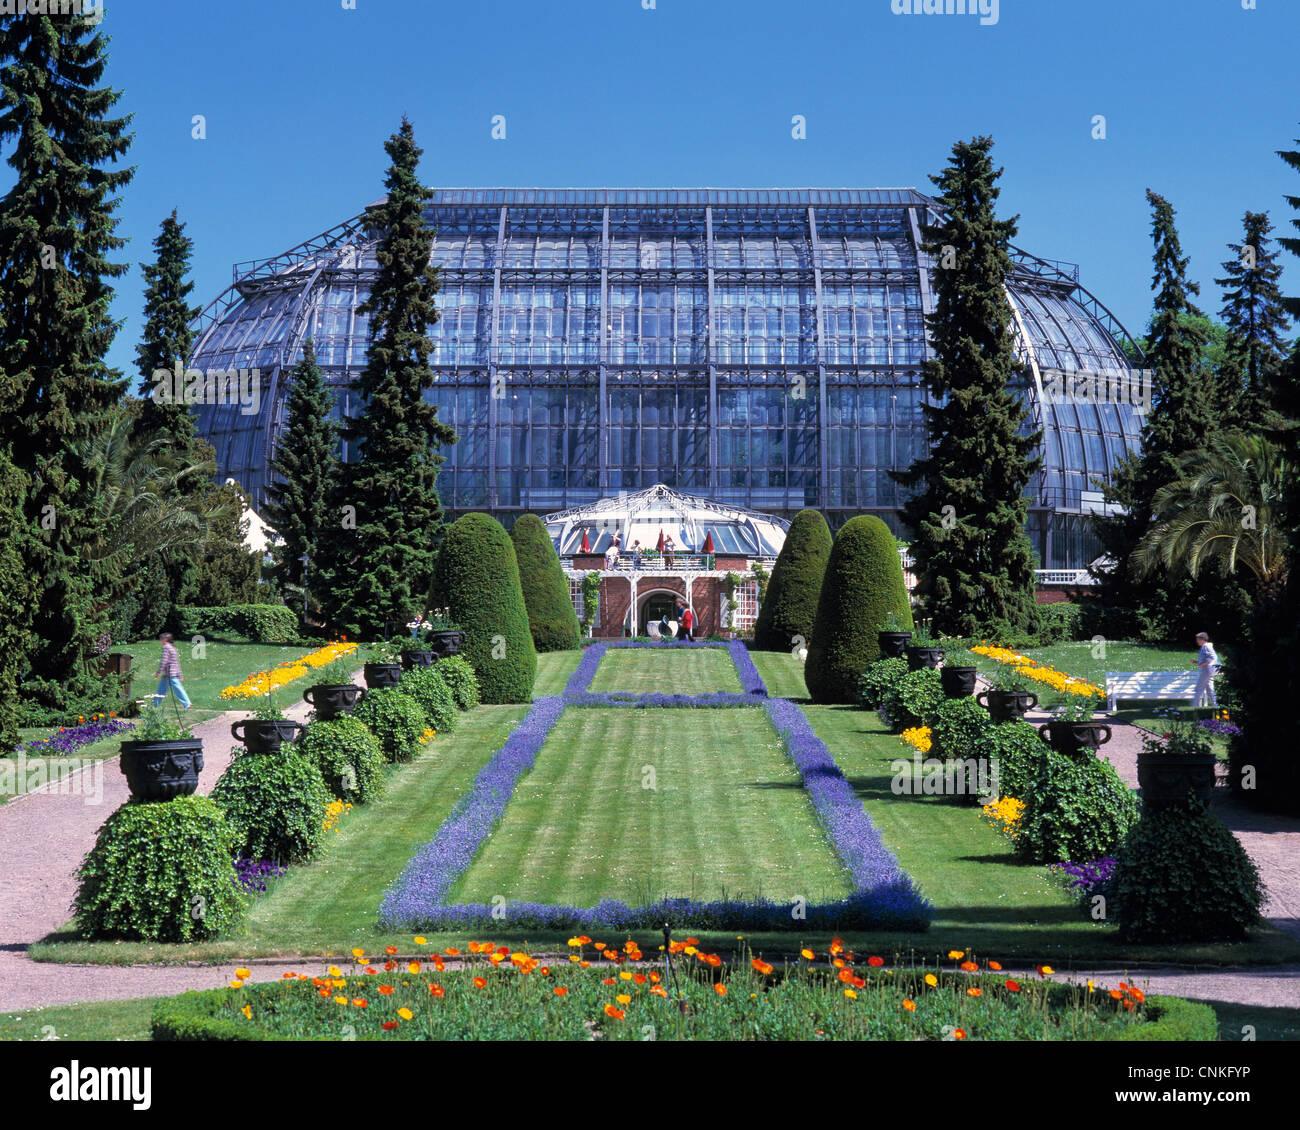 Botanischer Garten Berlin Und Botanisches Museum Berlin Dahlem In